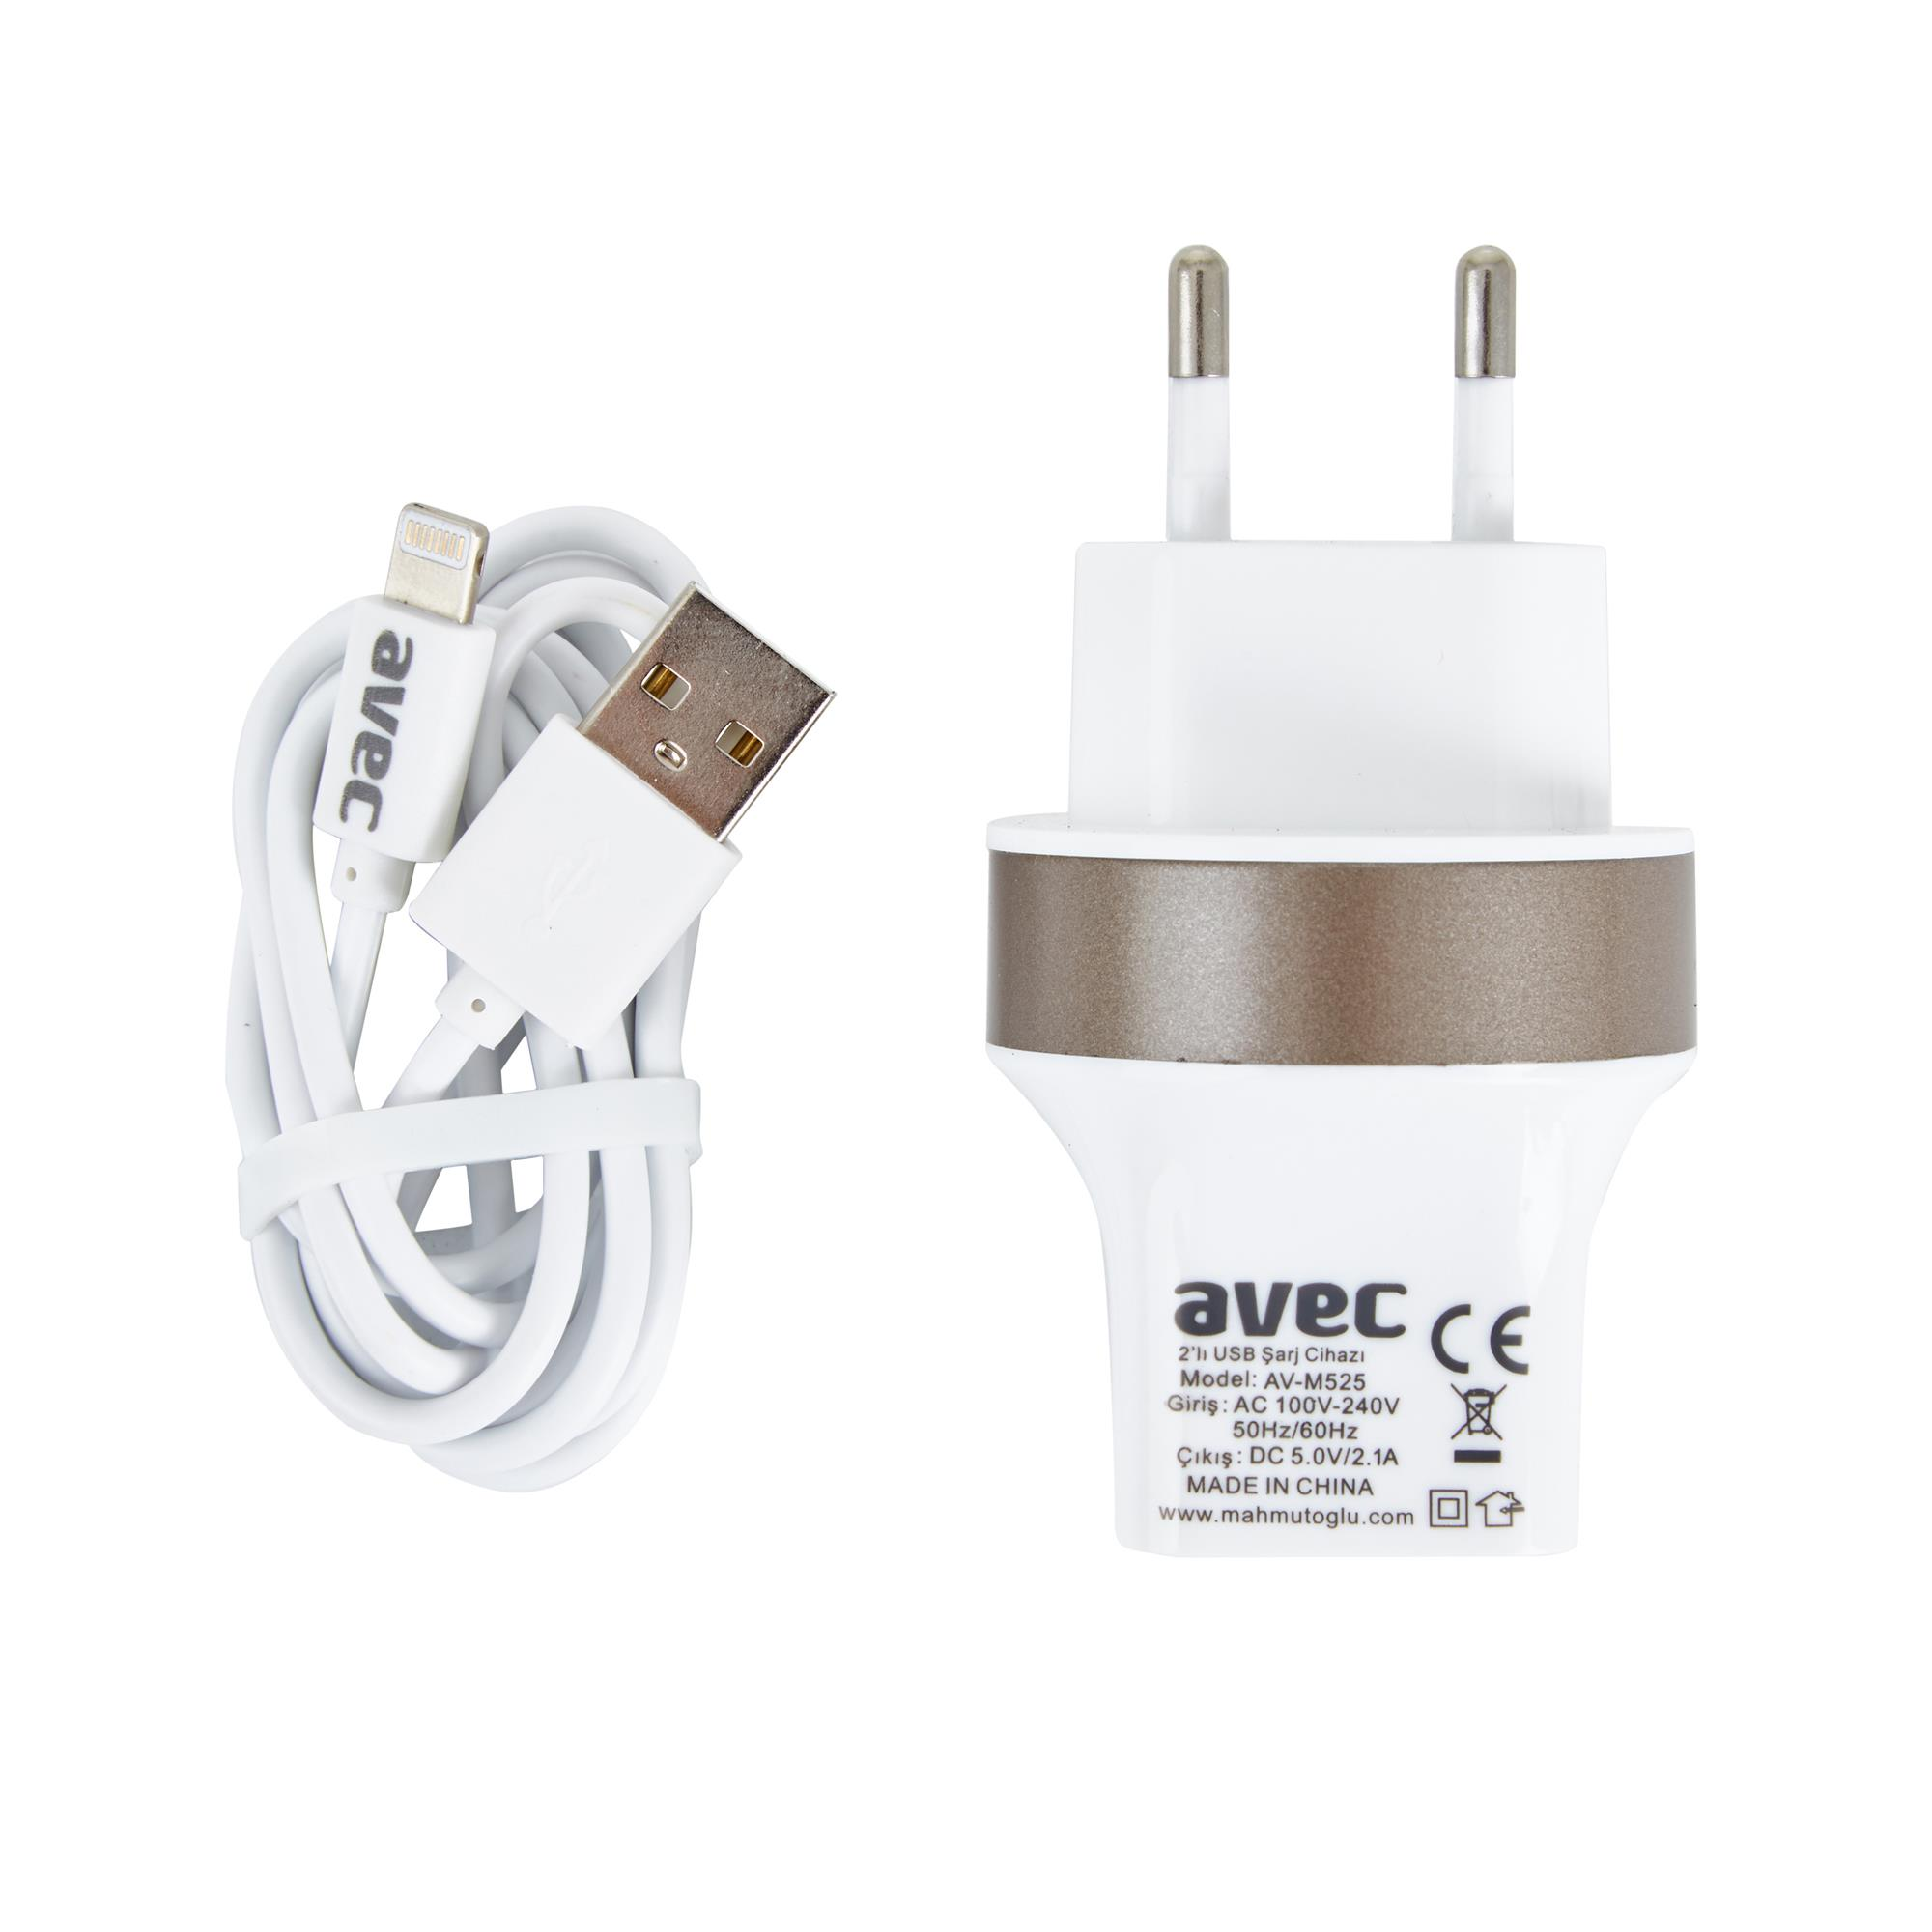 AVEC AV-M525 2.1A USB ŞARJ CİHAZI + AV-W106A IP5/IP6 KABLO SETİ